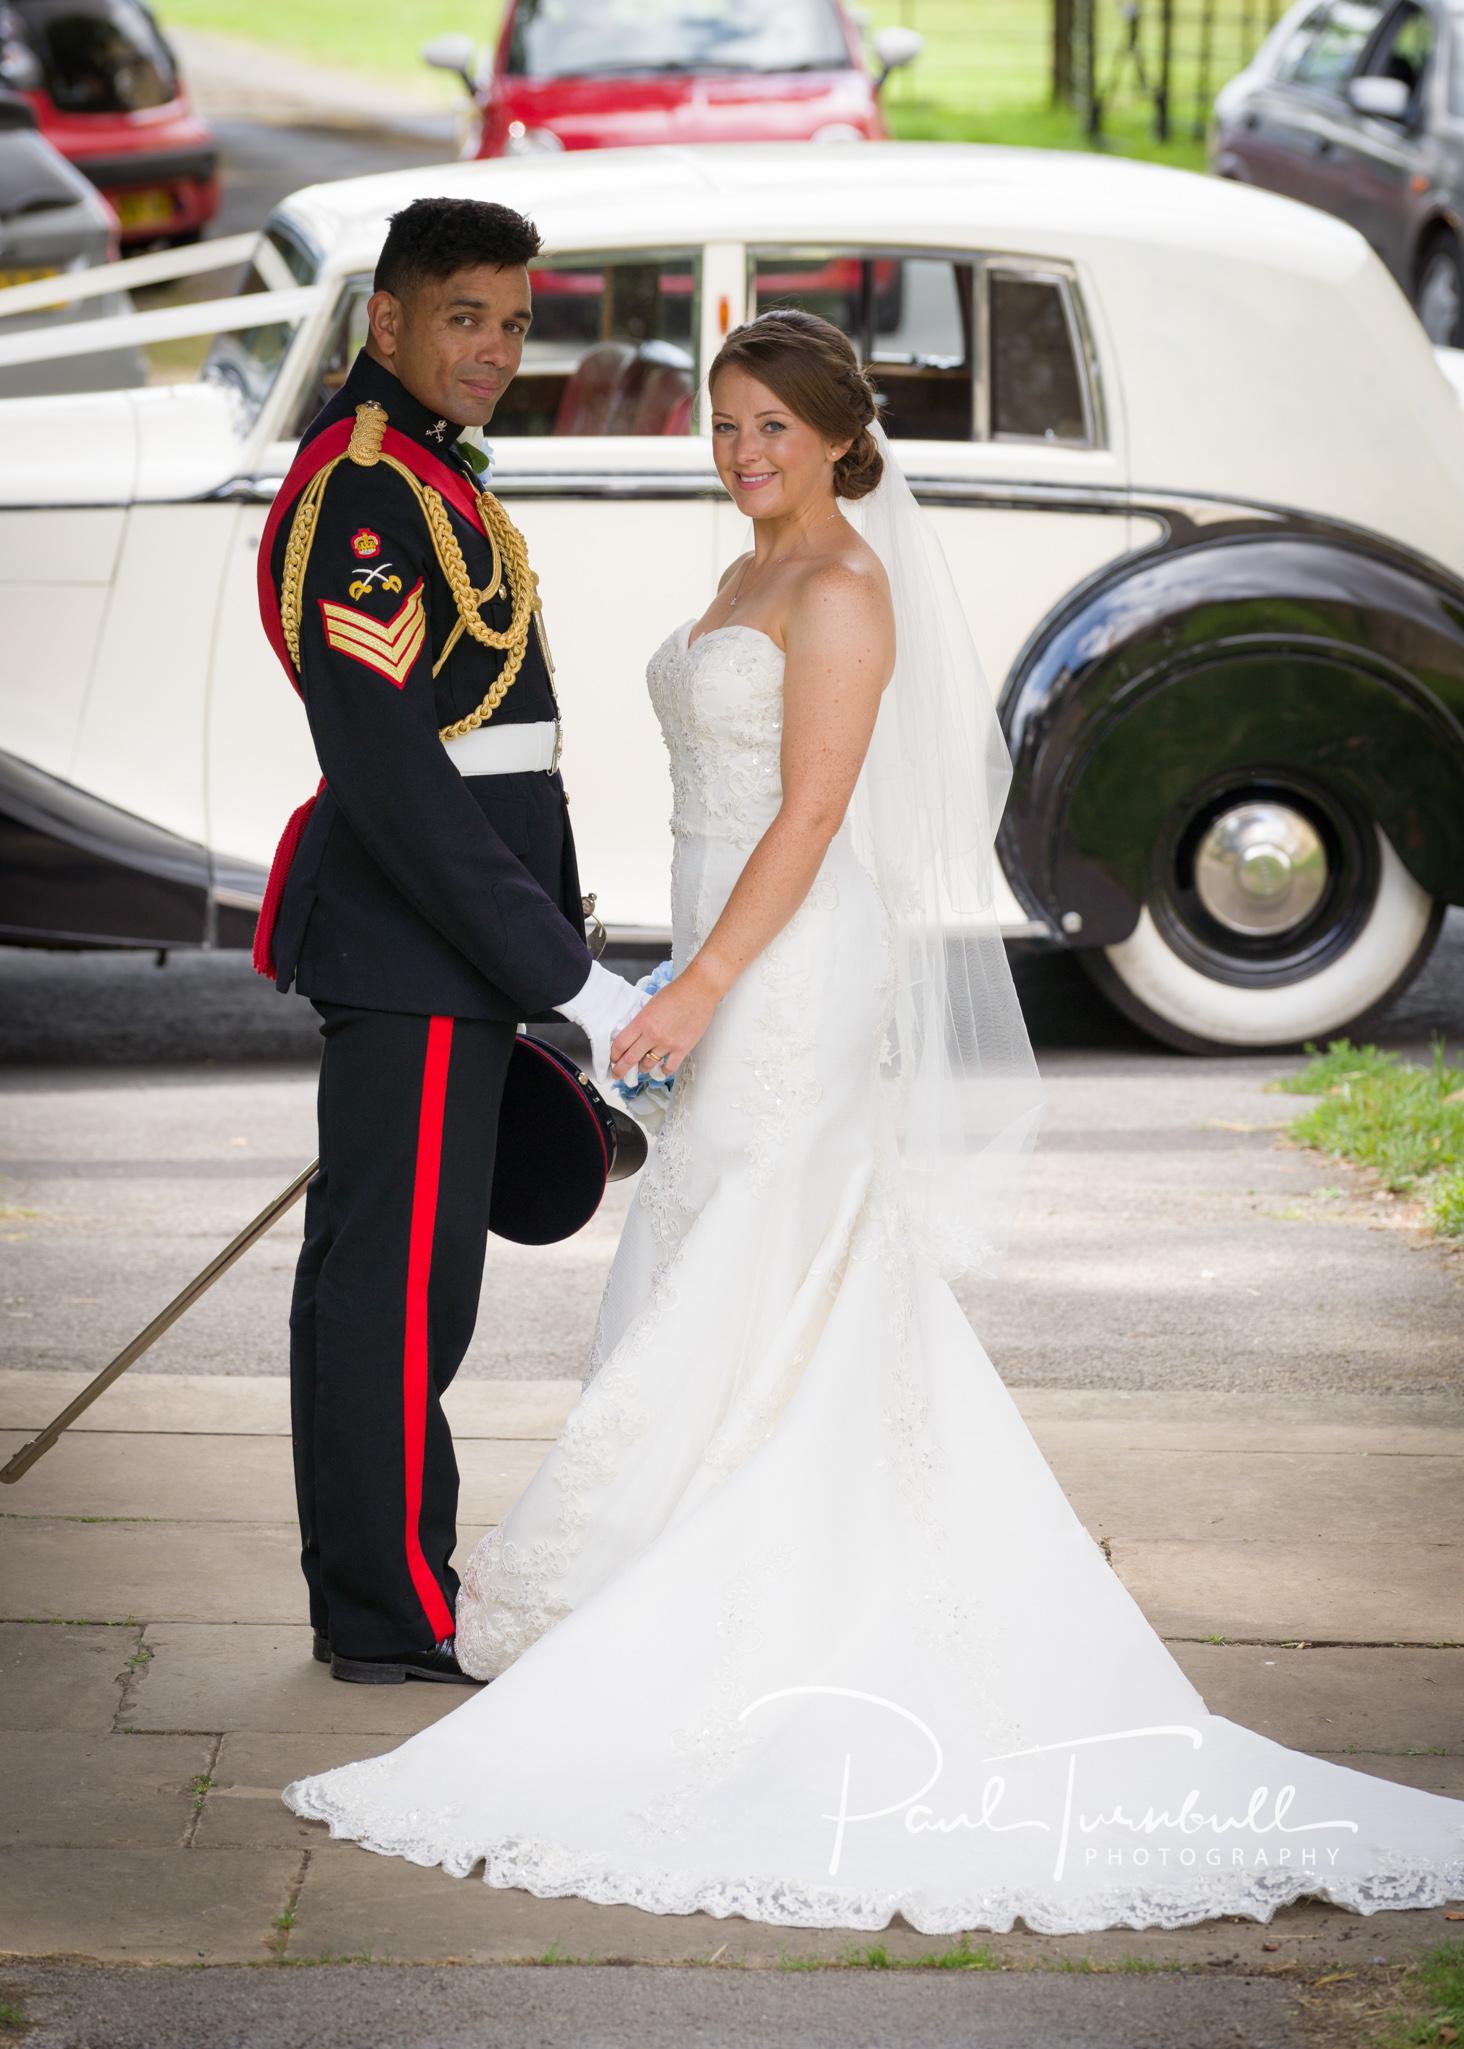 wedding-photographer-south-dalton-walkington-yorkshire-emma-james-048.jpg